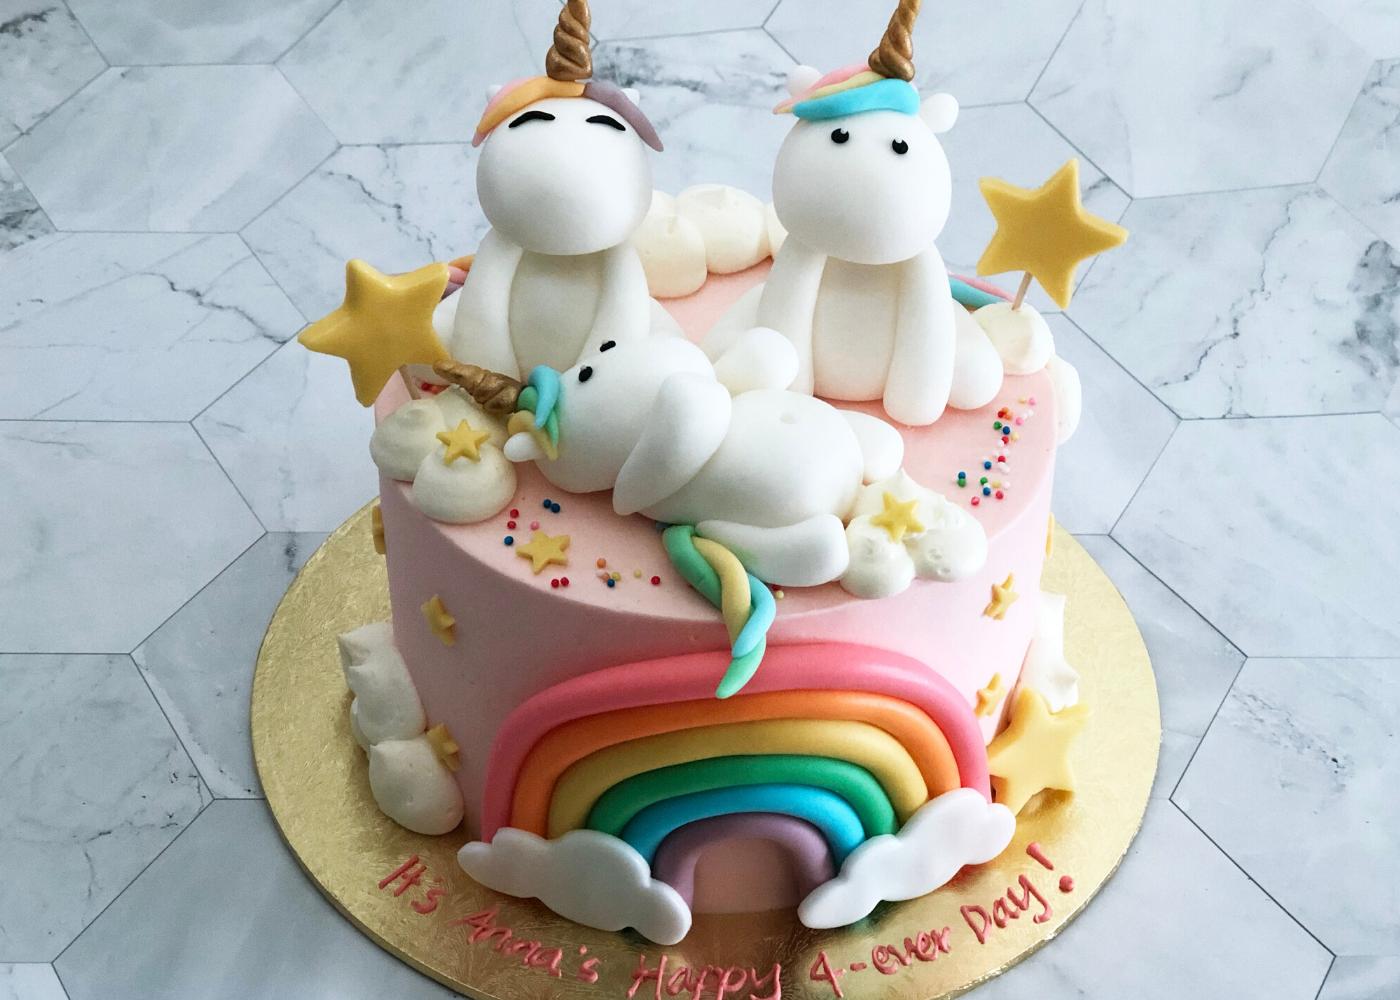 unicorn cake monice bakes | home bakers singapore